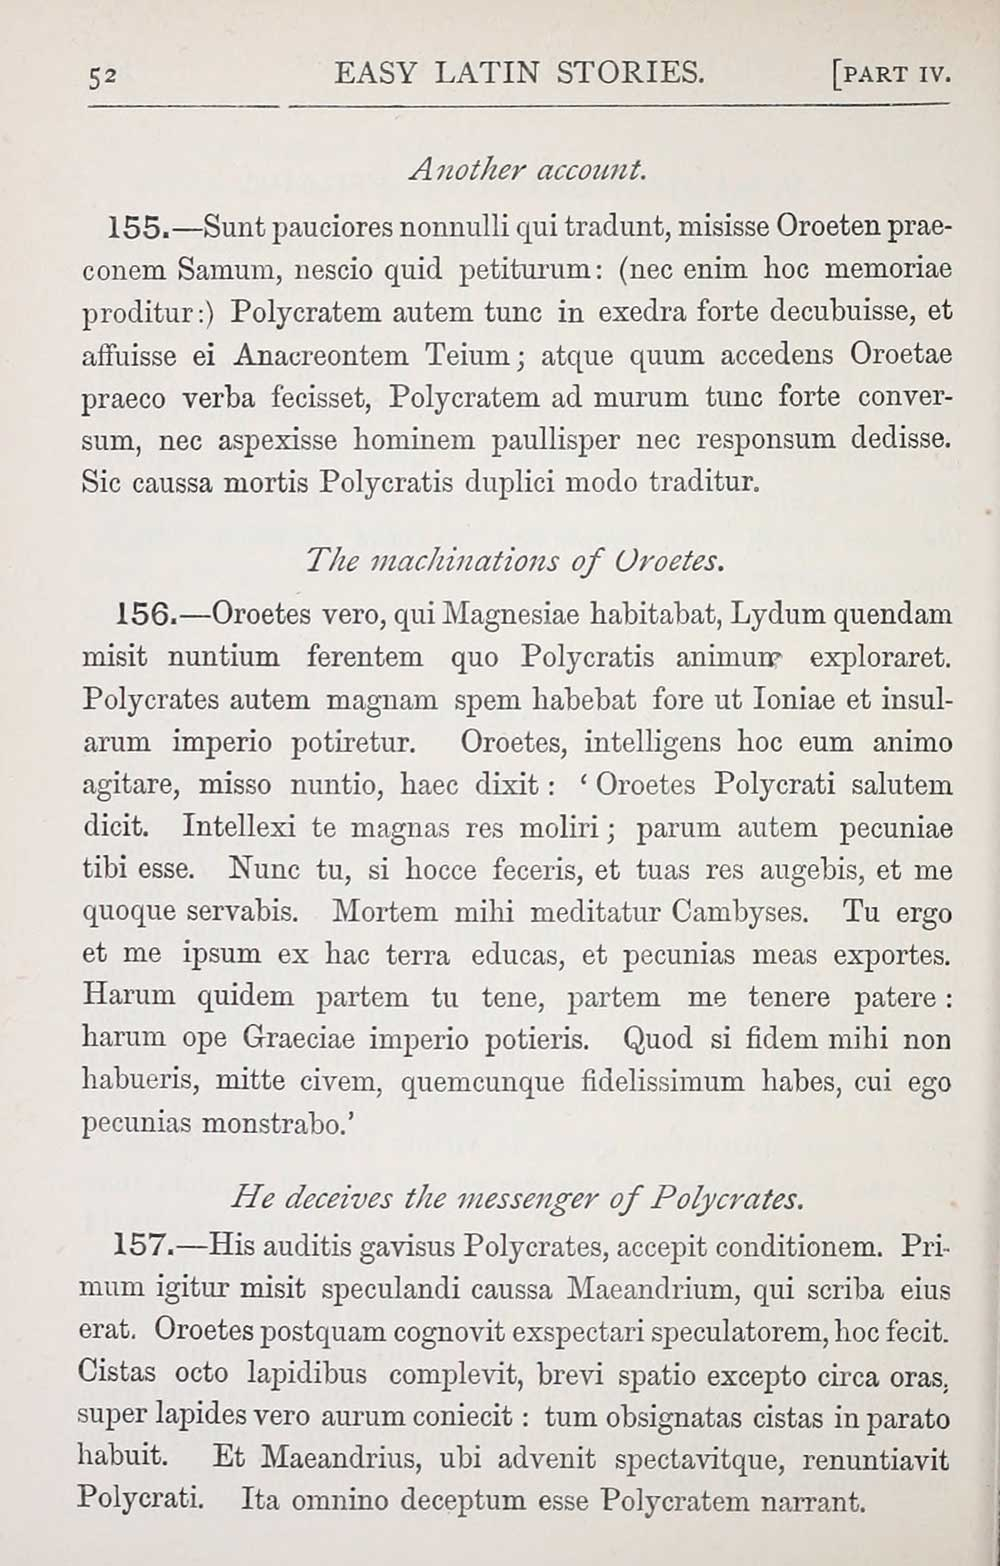 Gavisus latino dating